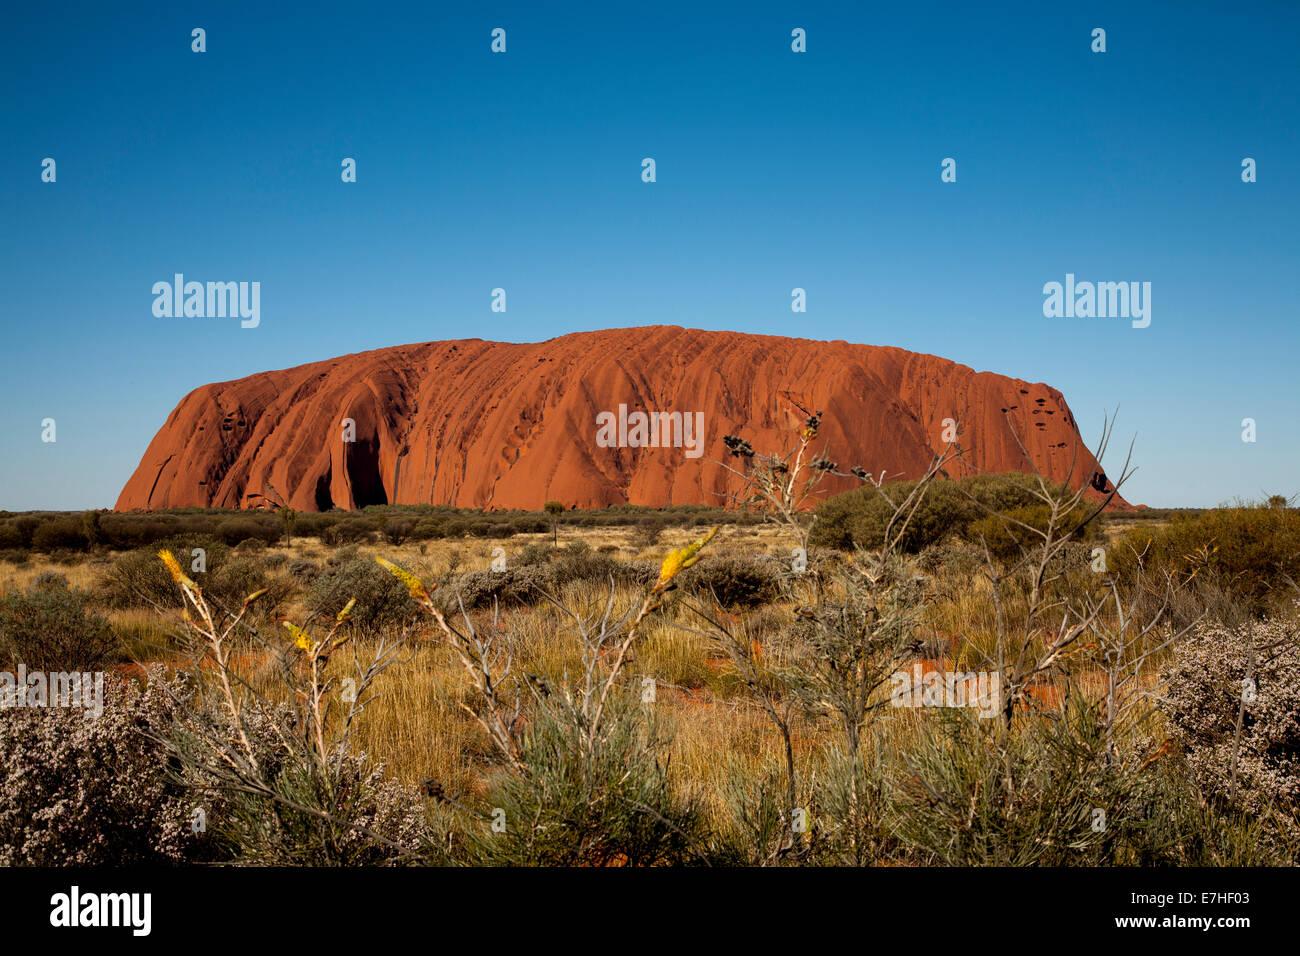 Ayers Rock, Uluru-Kata Tjuta National Park, Northern Territory, Australia - Stock Image